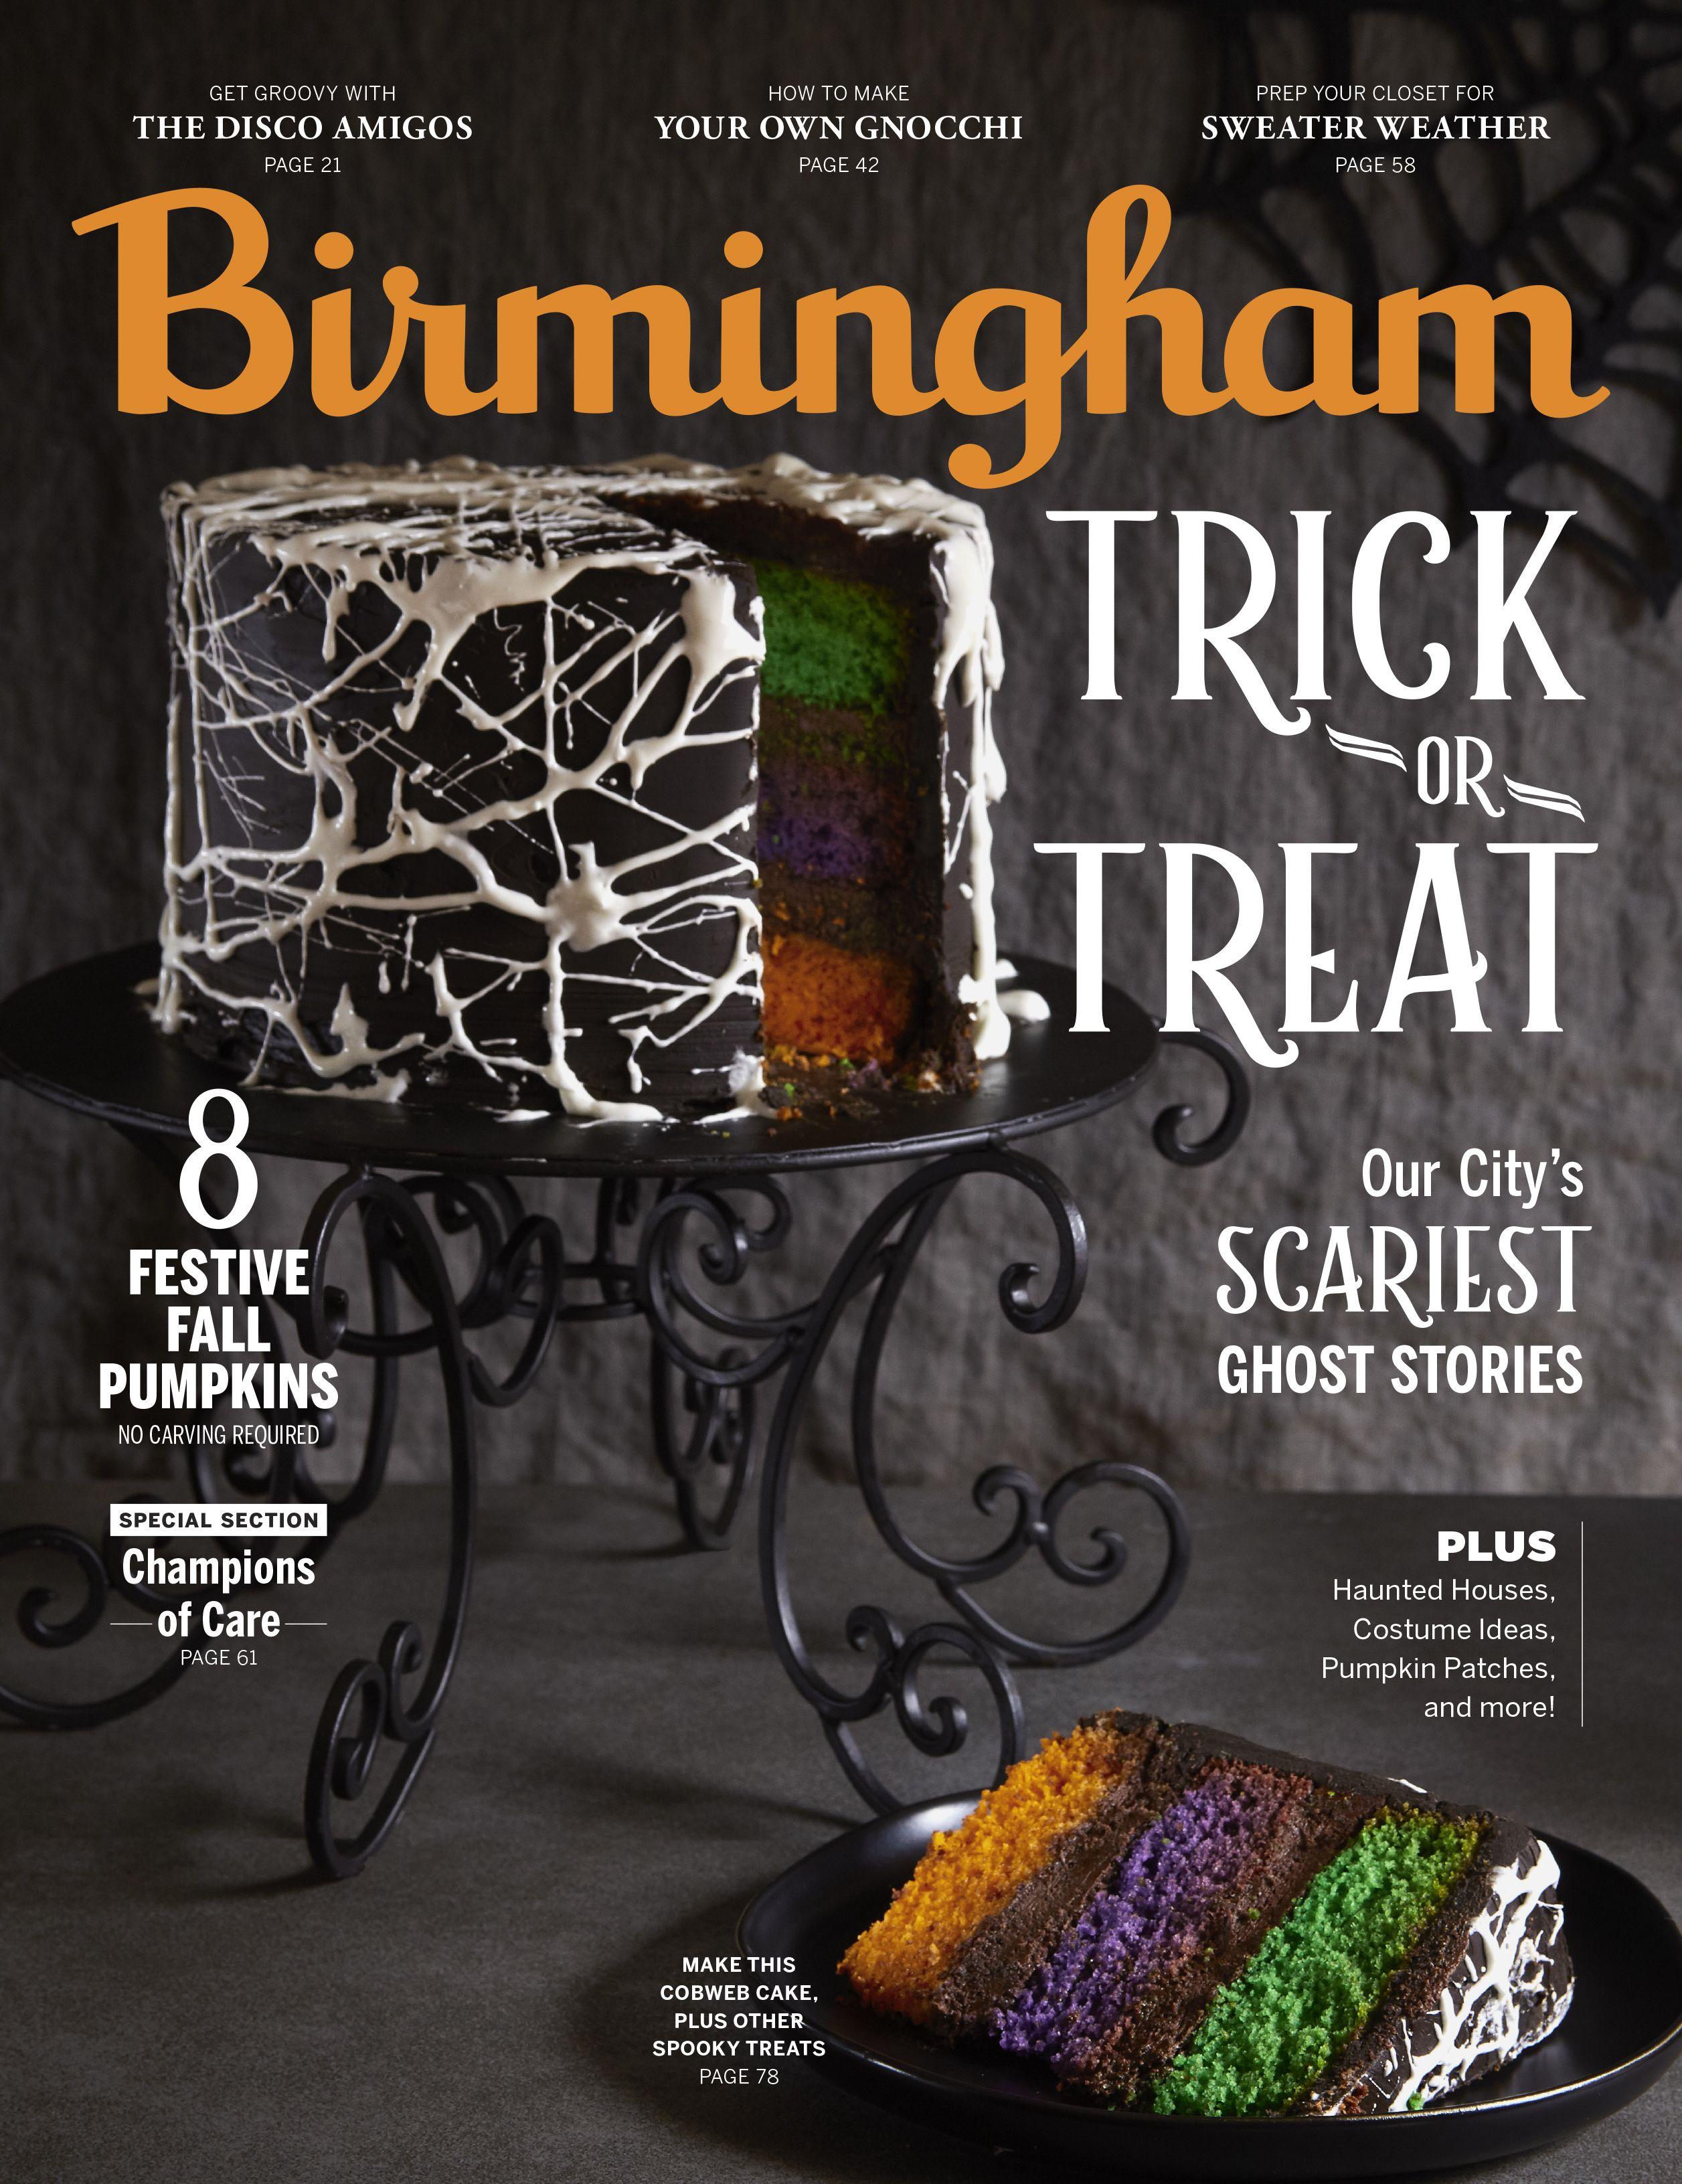 Treats Magazine Halloween 2020 Birmingham magazine October 2019 // The Trick or Treat Issue in